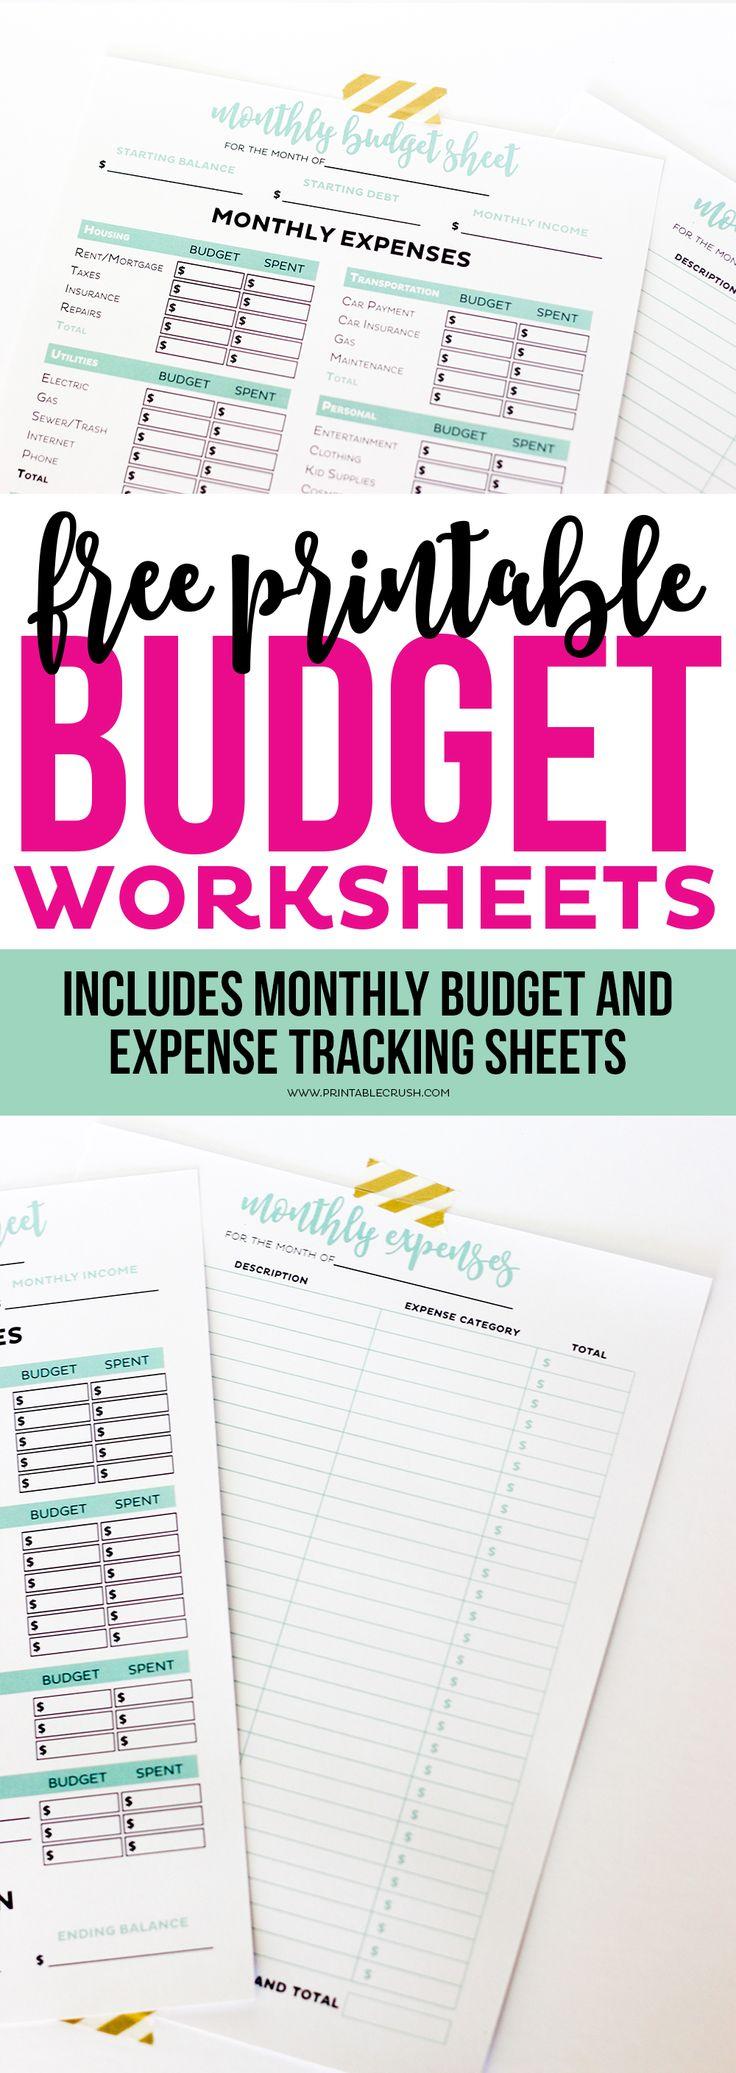 keep track of spending spreadsheet elegant keep track spending